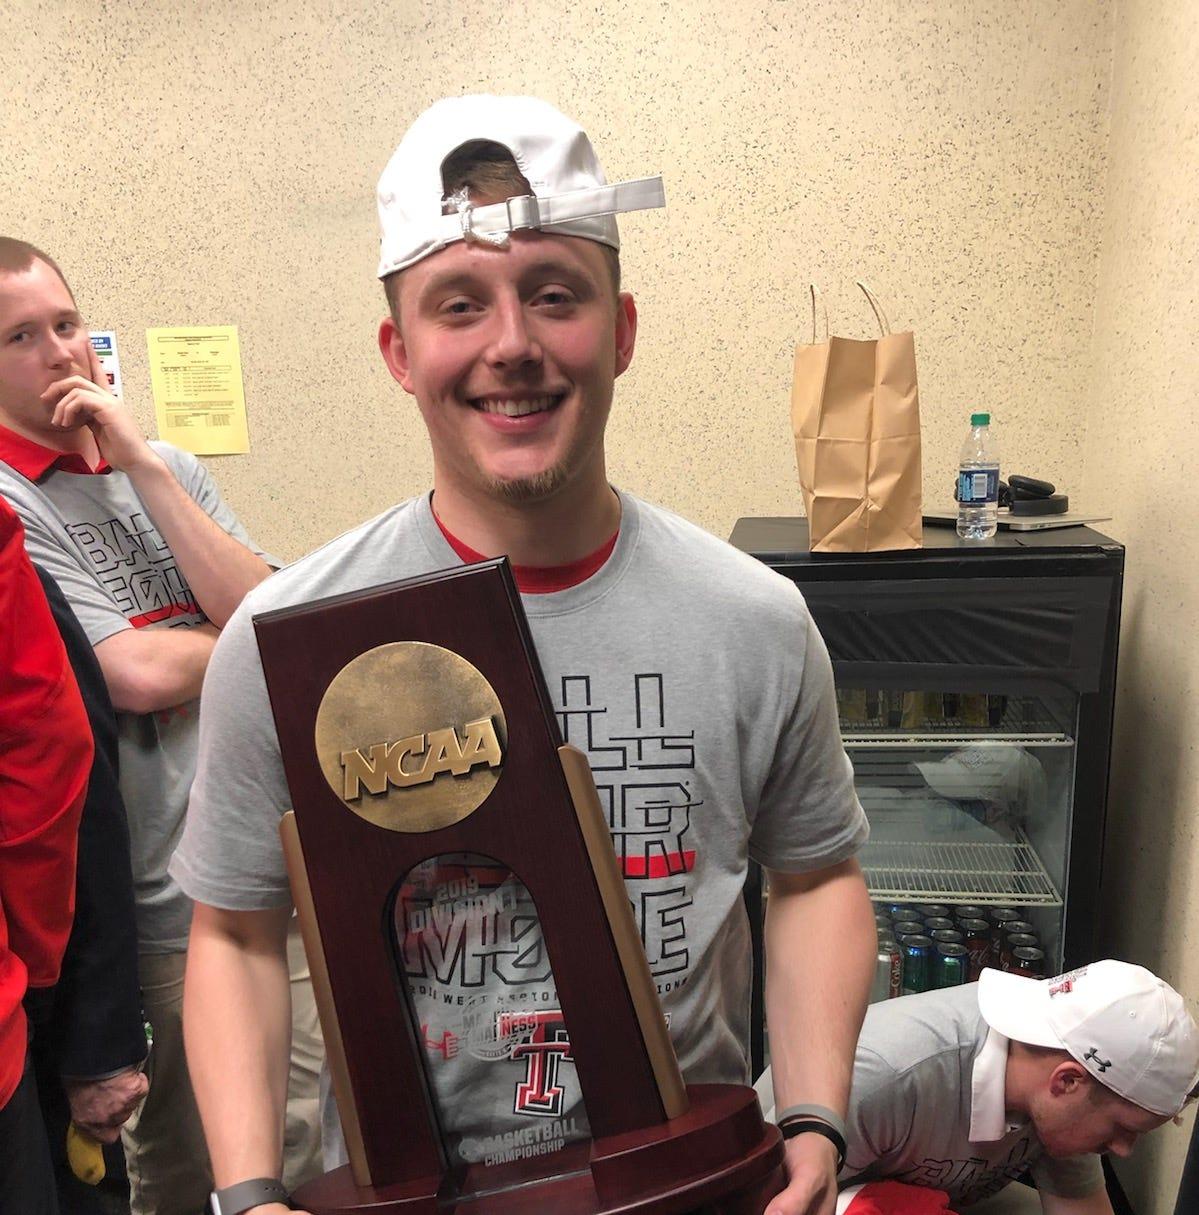 Holliday alum Noah Parker had front-row ticket to Texas Tech's special season